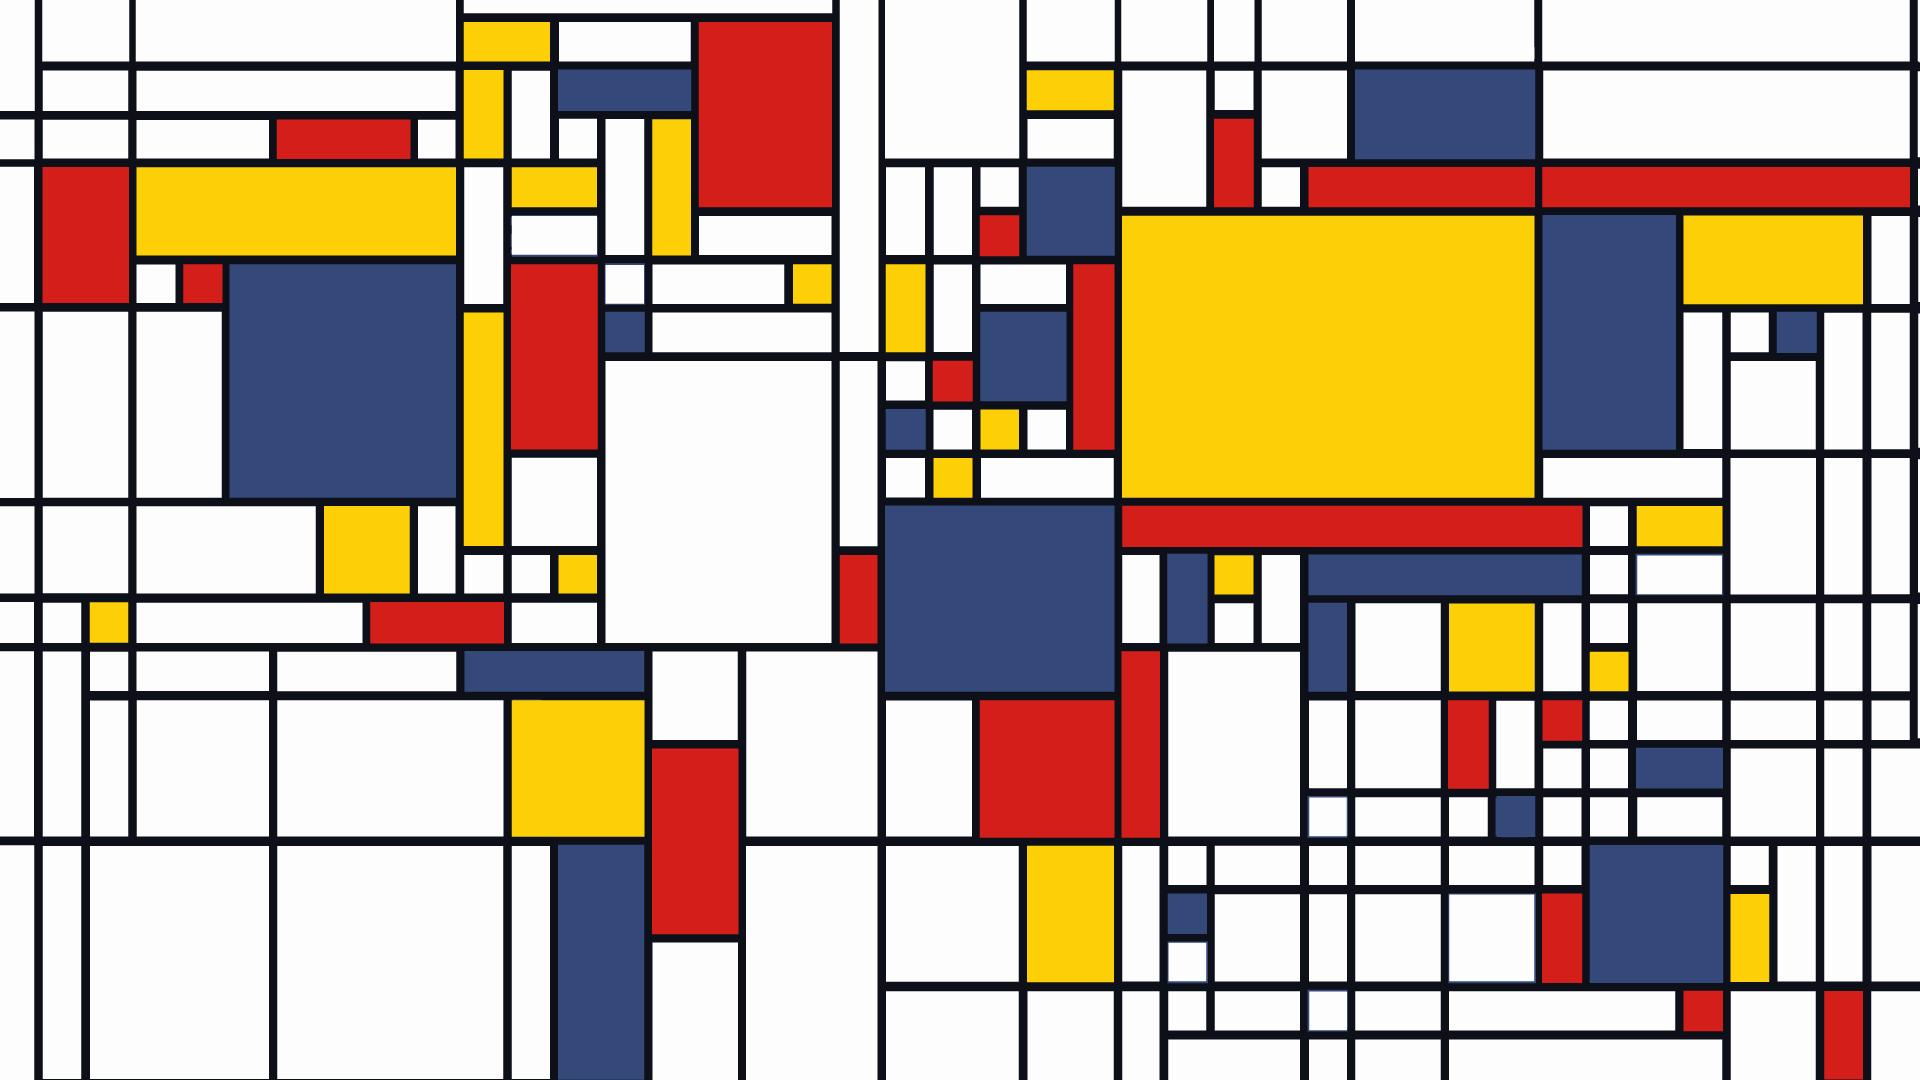 World Map in the manner of Piet Mondrian [948×730] : MapPorn